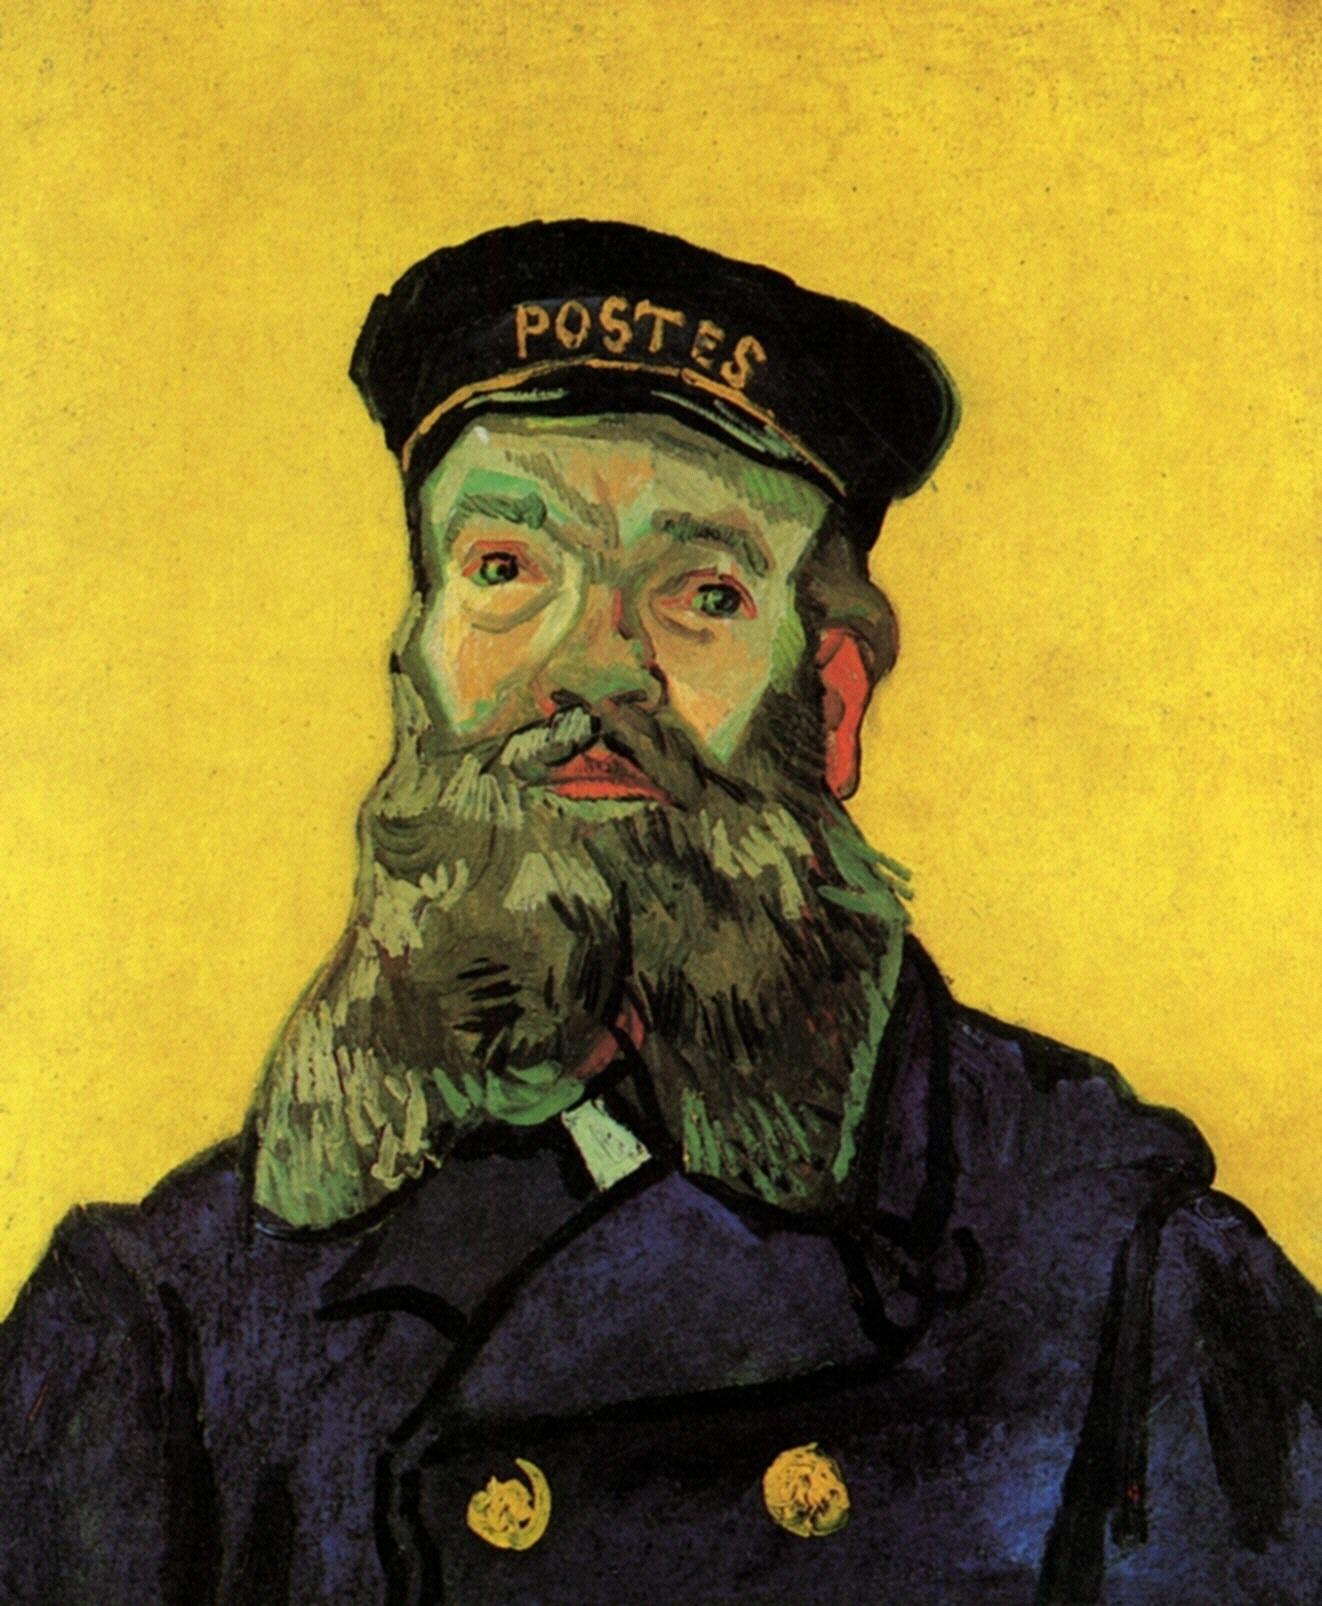 Portrait of the Postman Joseph Roulin - Vincent van Gogh - WikiArt.org